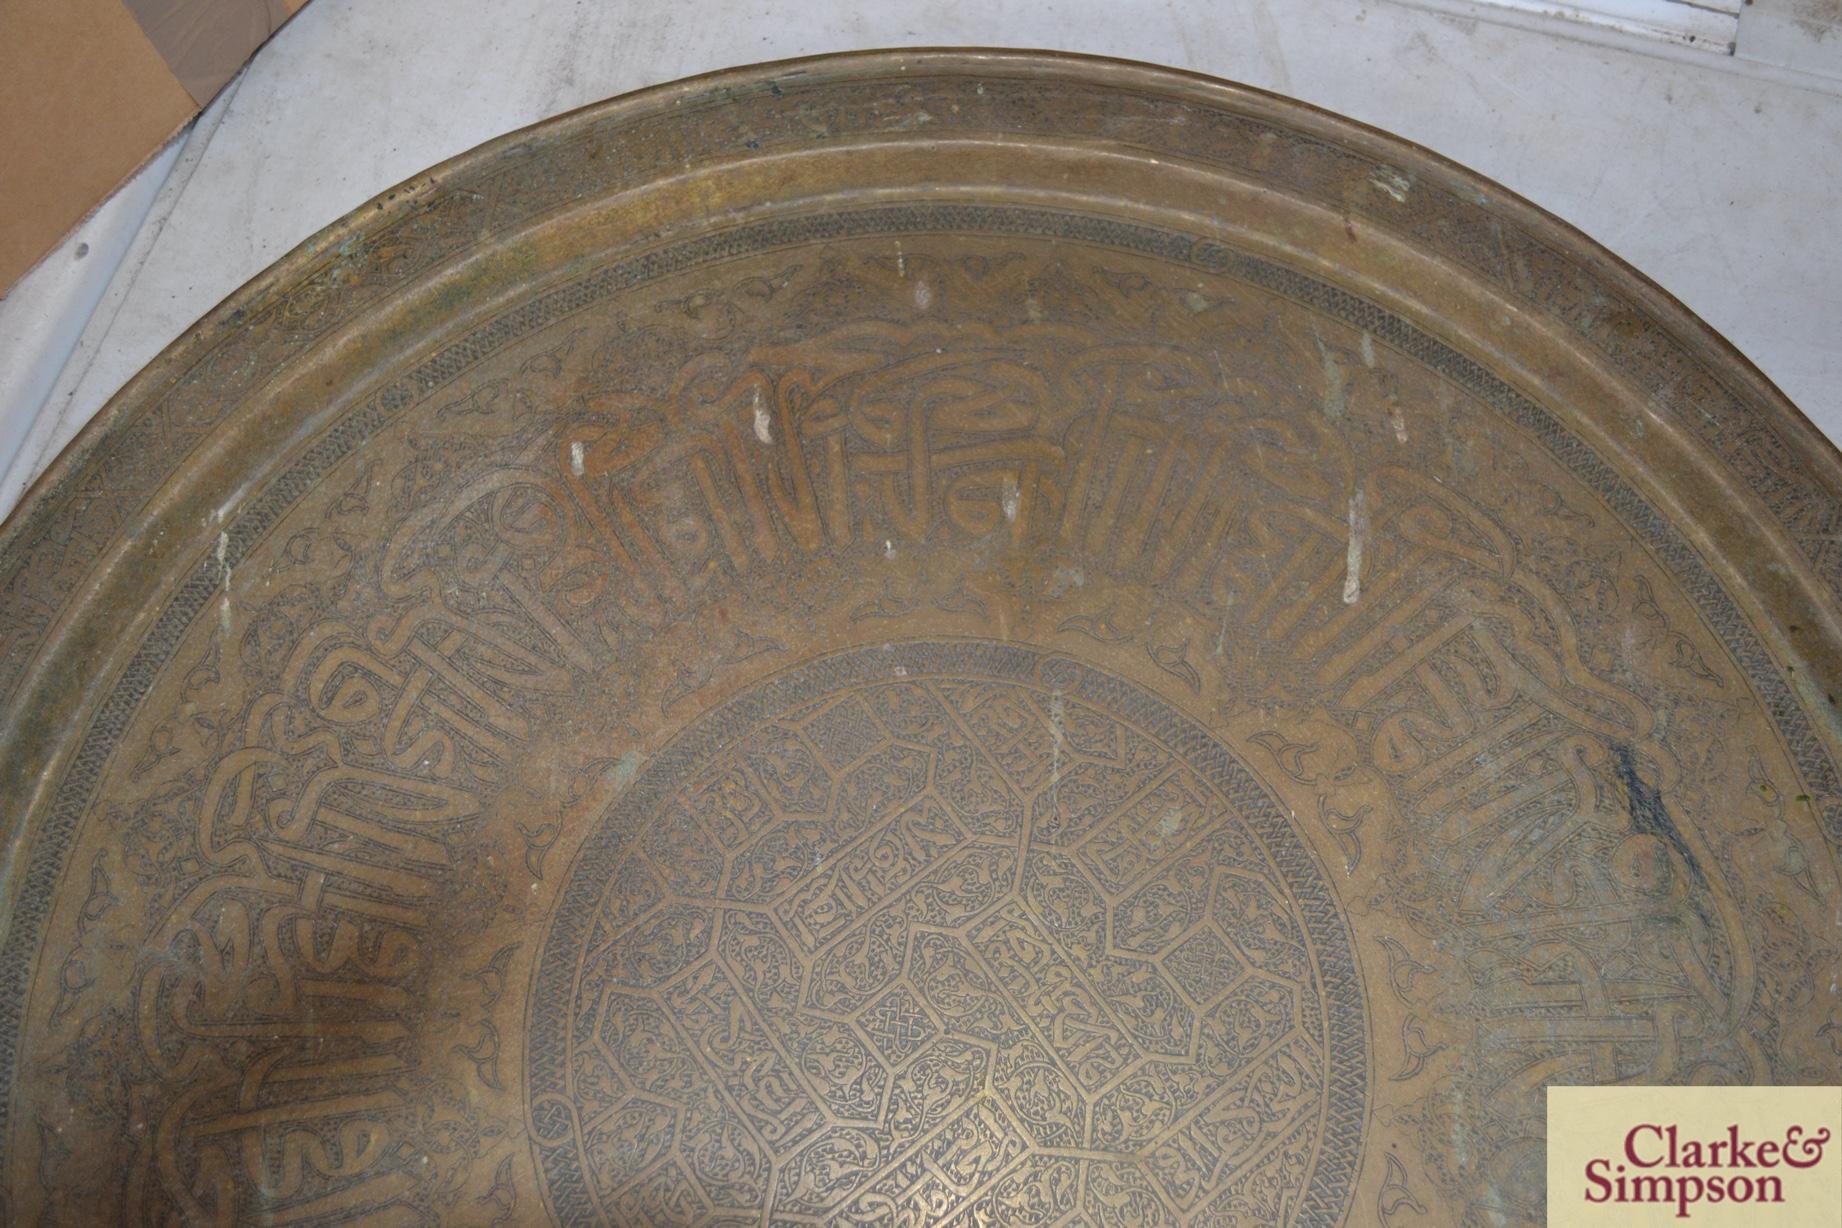 An Eastern circular brass tray - Image 2 of 3